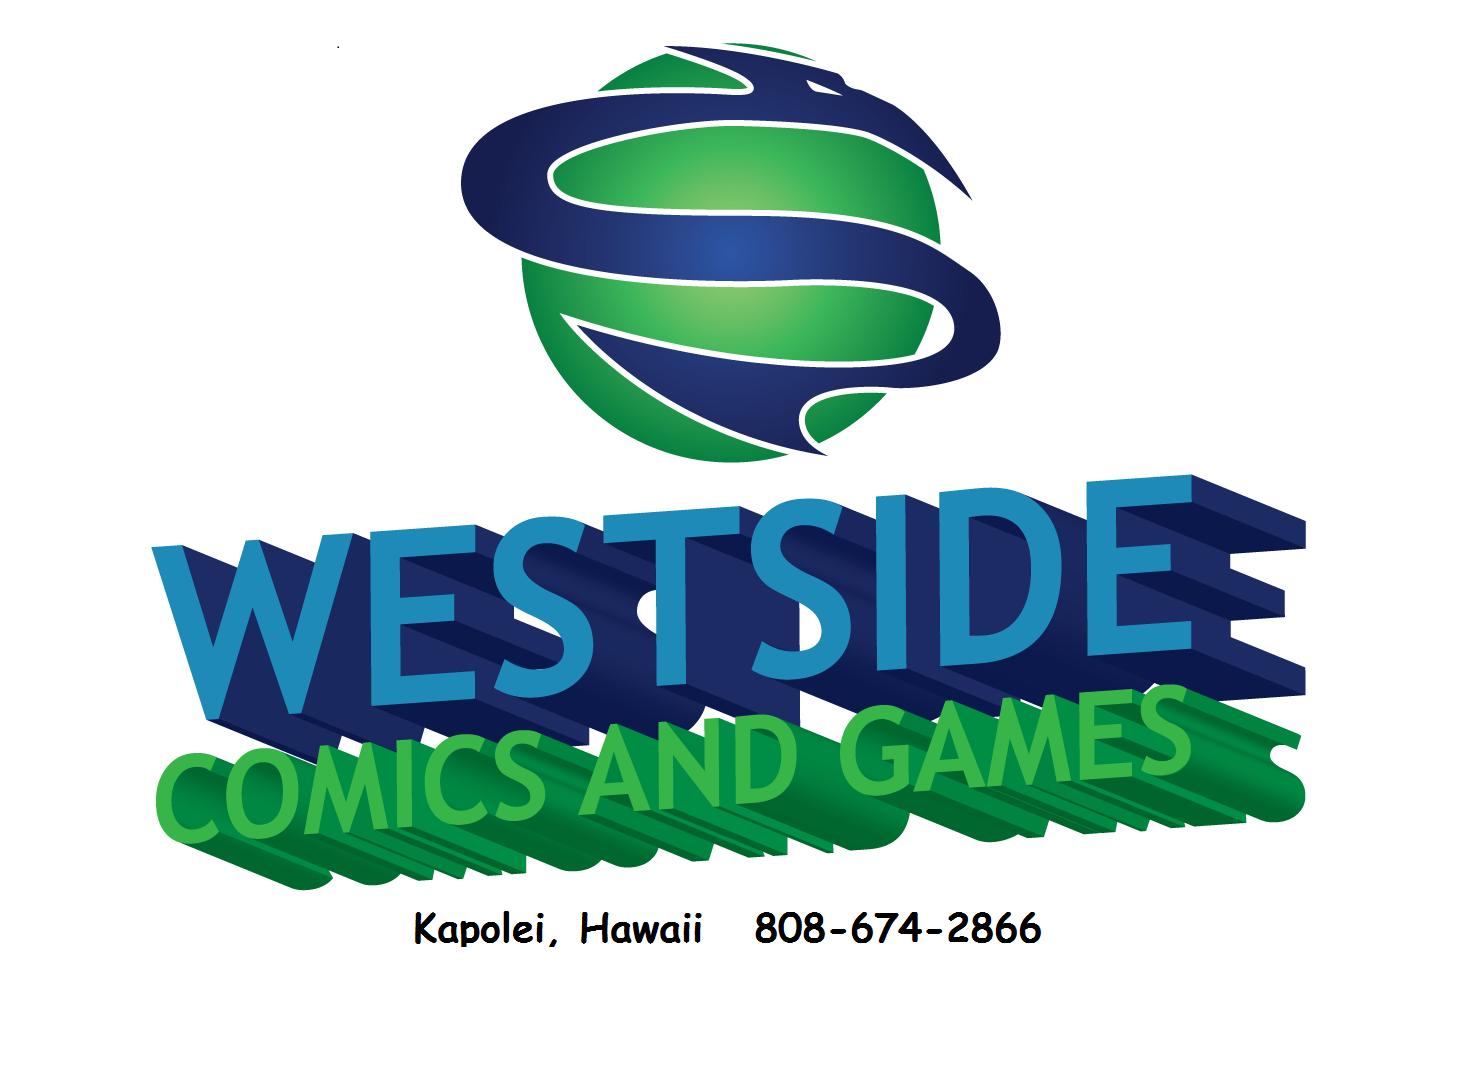 WestSideComicsLogo1.png